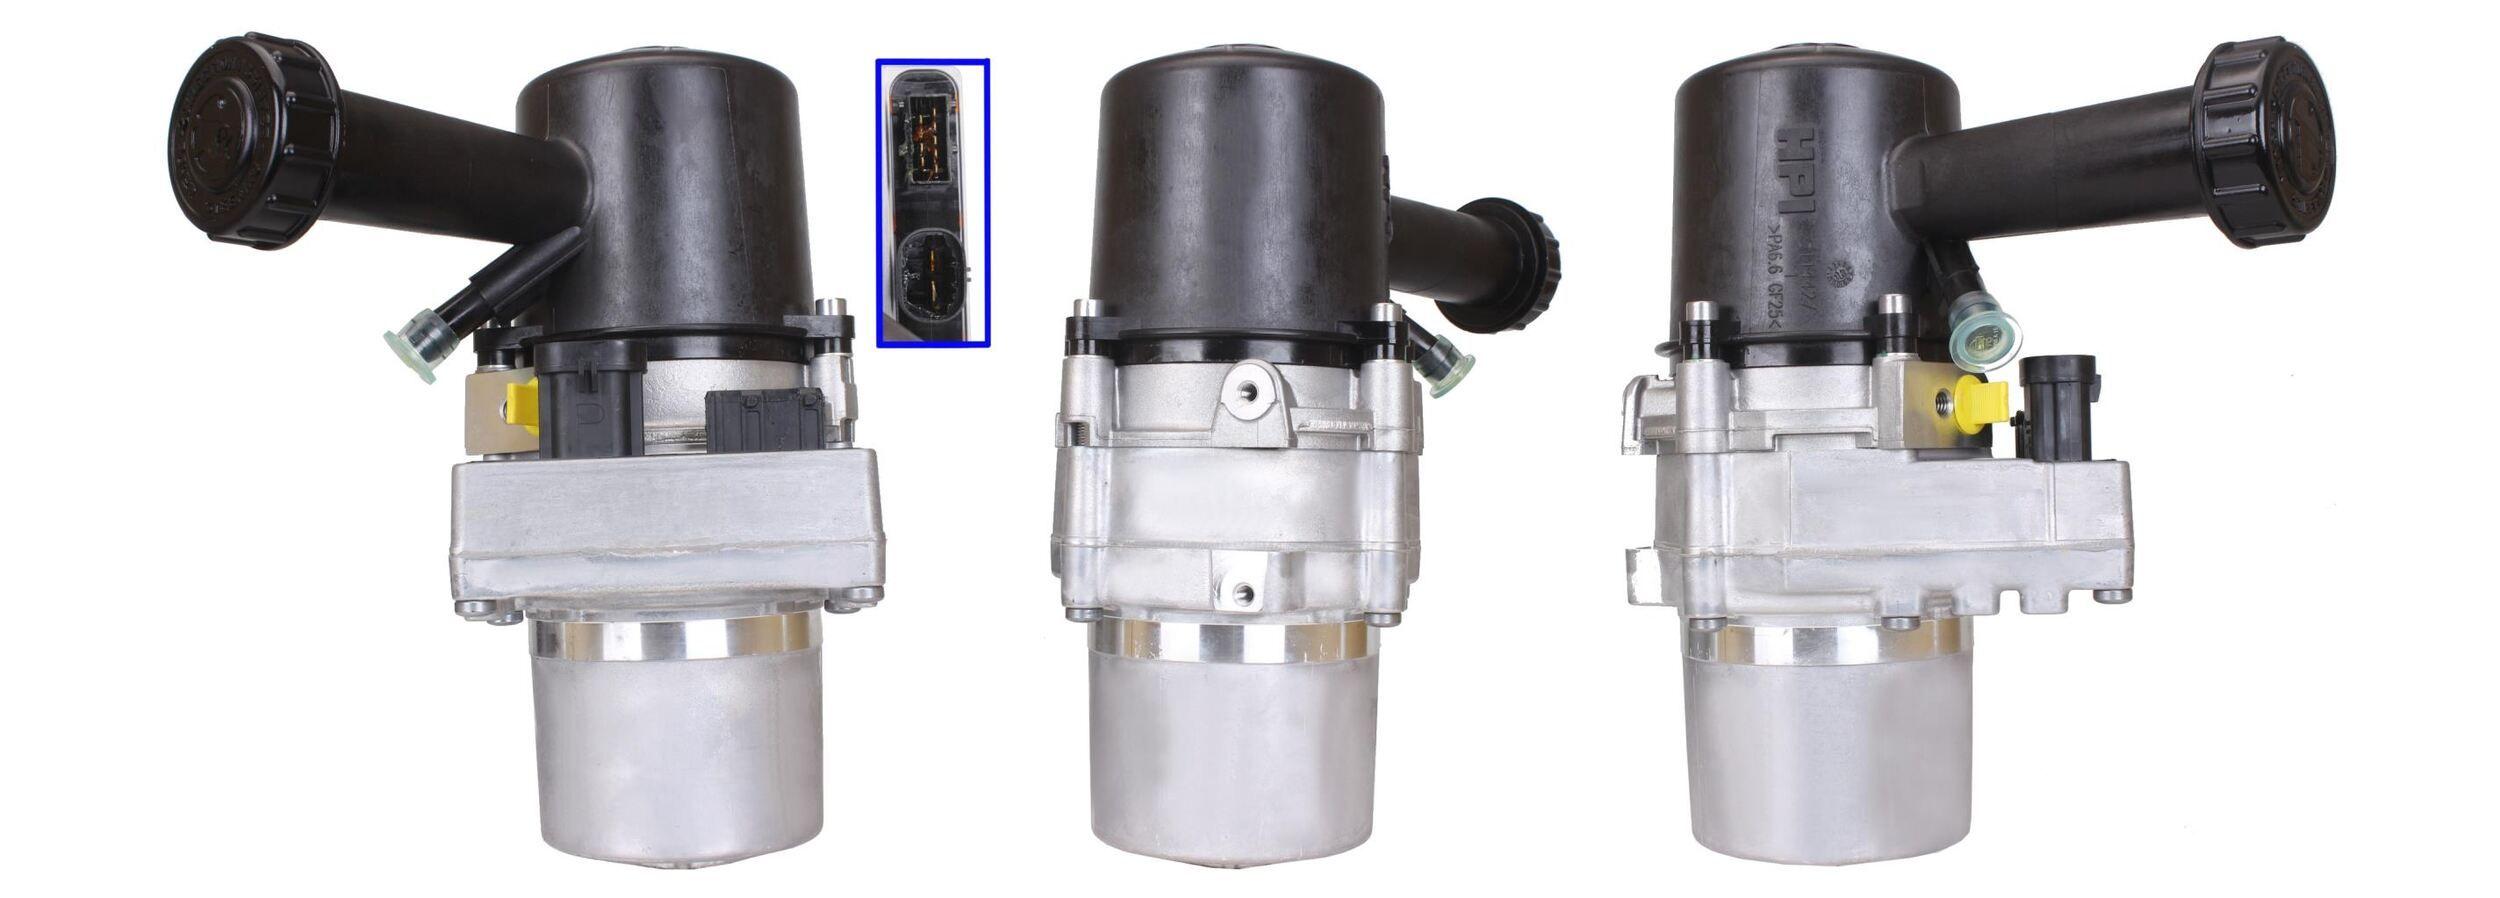 Origine Pompe hydraulique DRI 719520619 (Pression [bar]: 98bar)